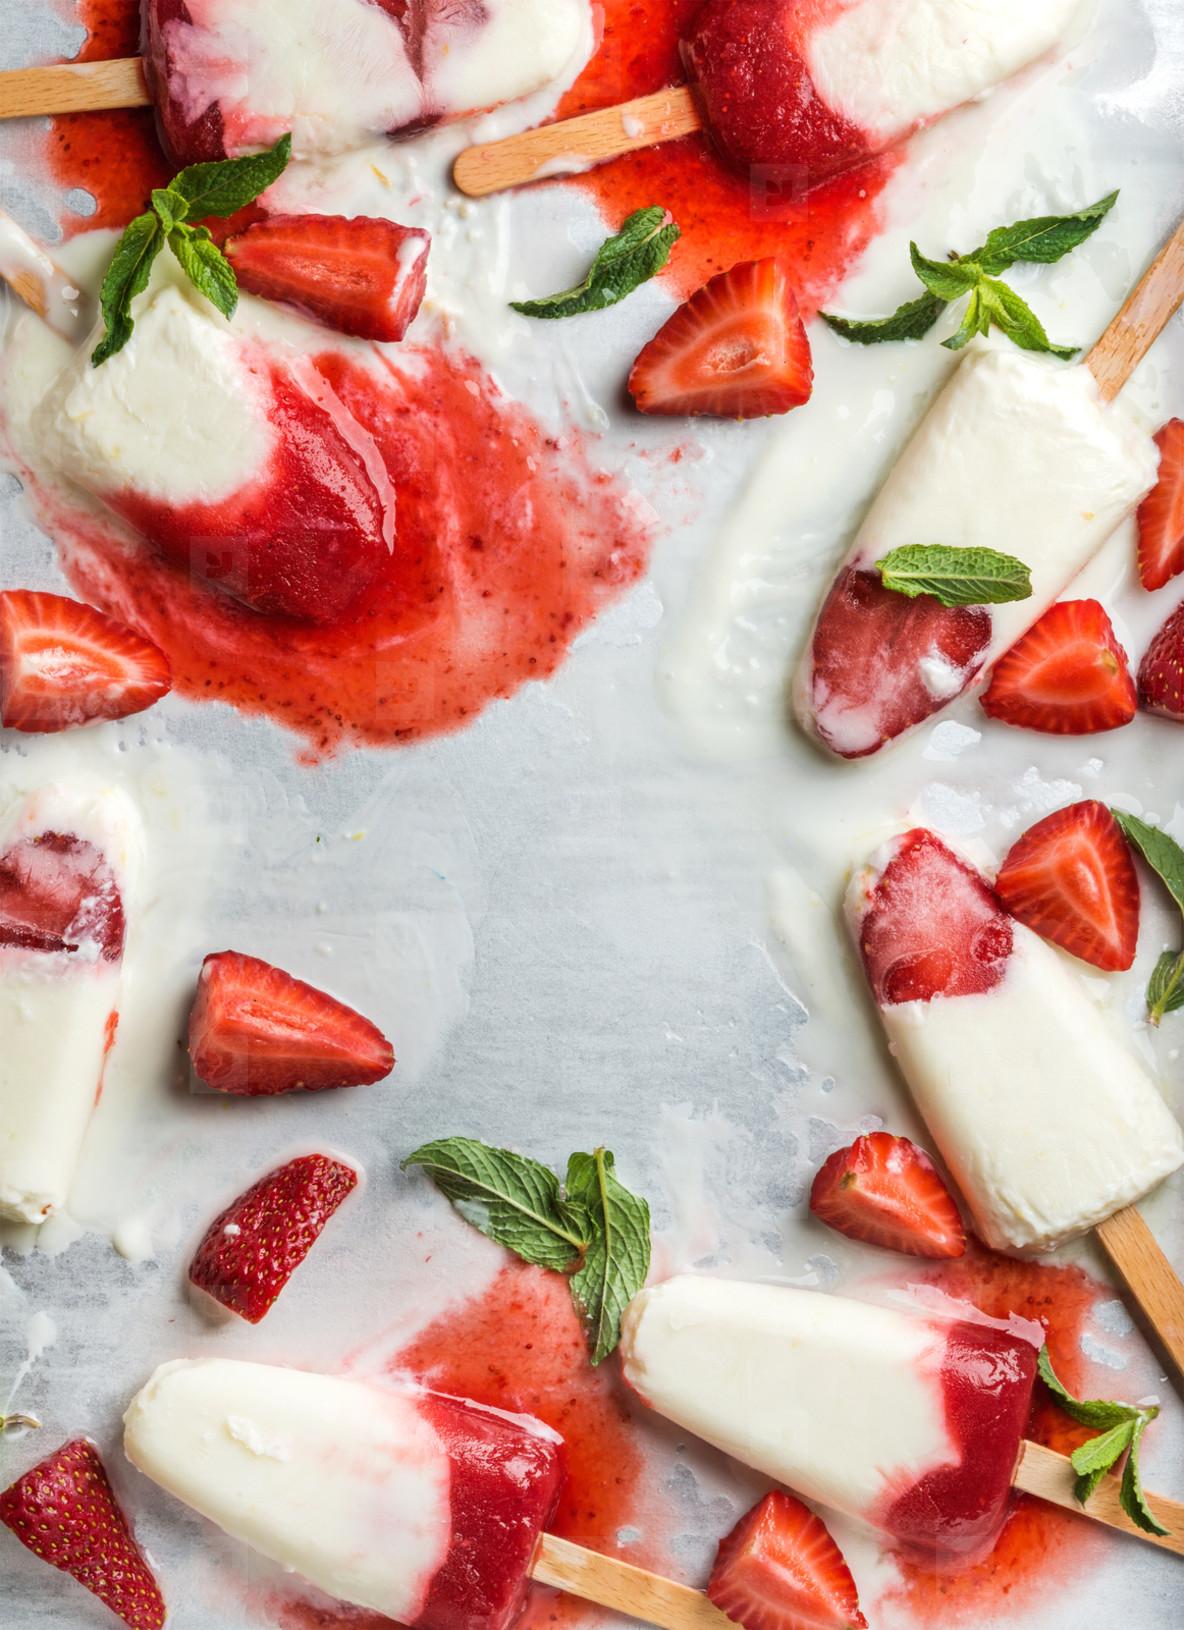 Strawberry yogurt ice cream popsicles with mint